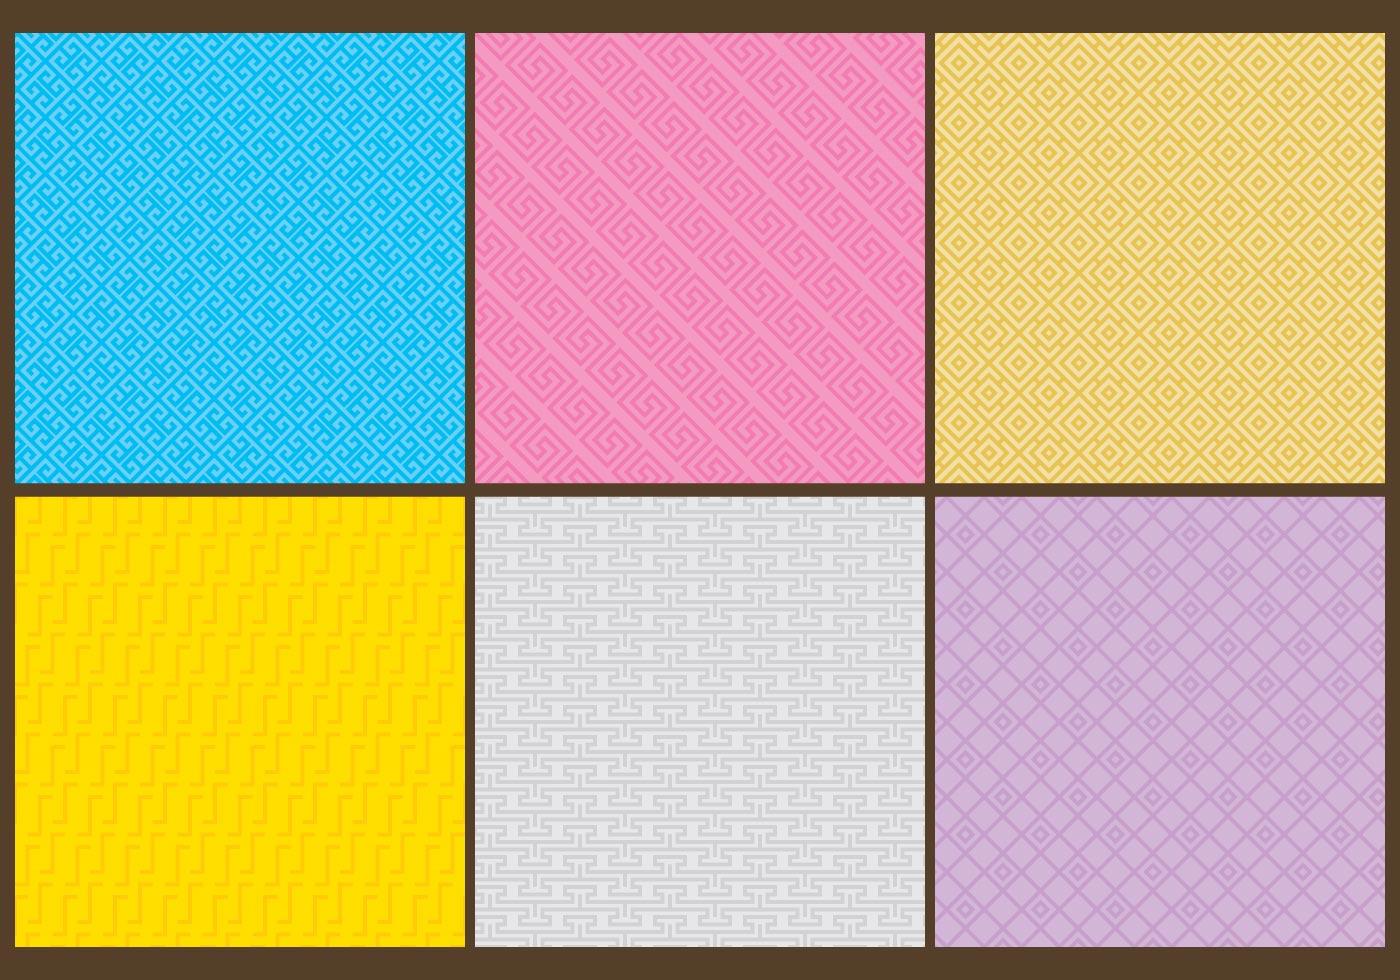 Greek Key Patterns - Download Free Vector Art, Stock ...